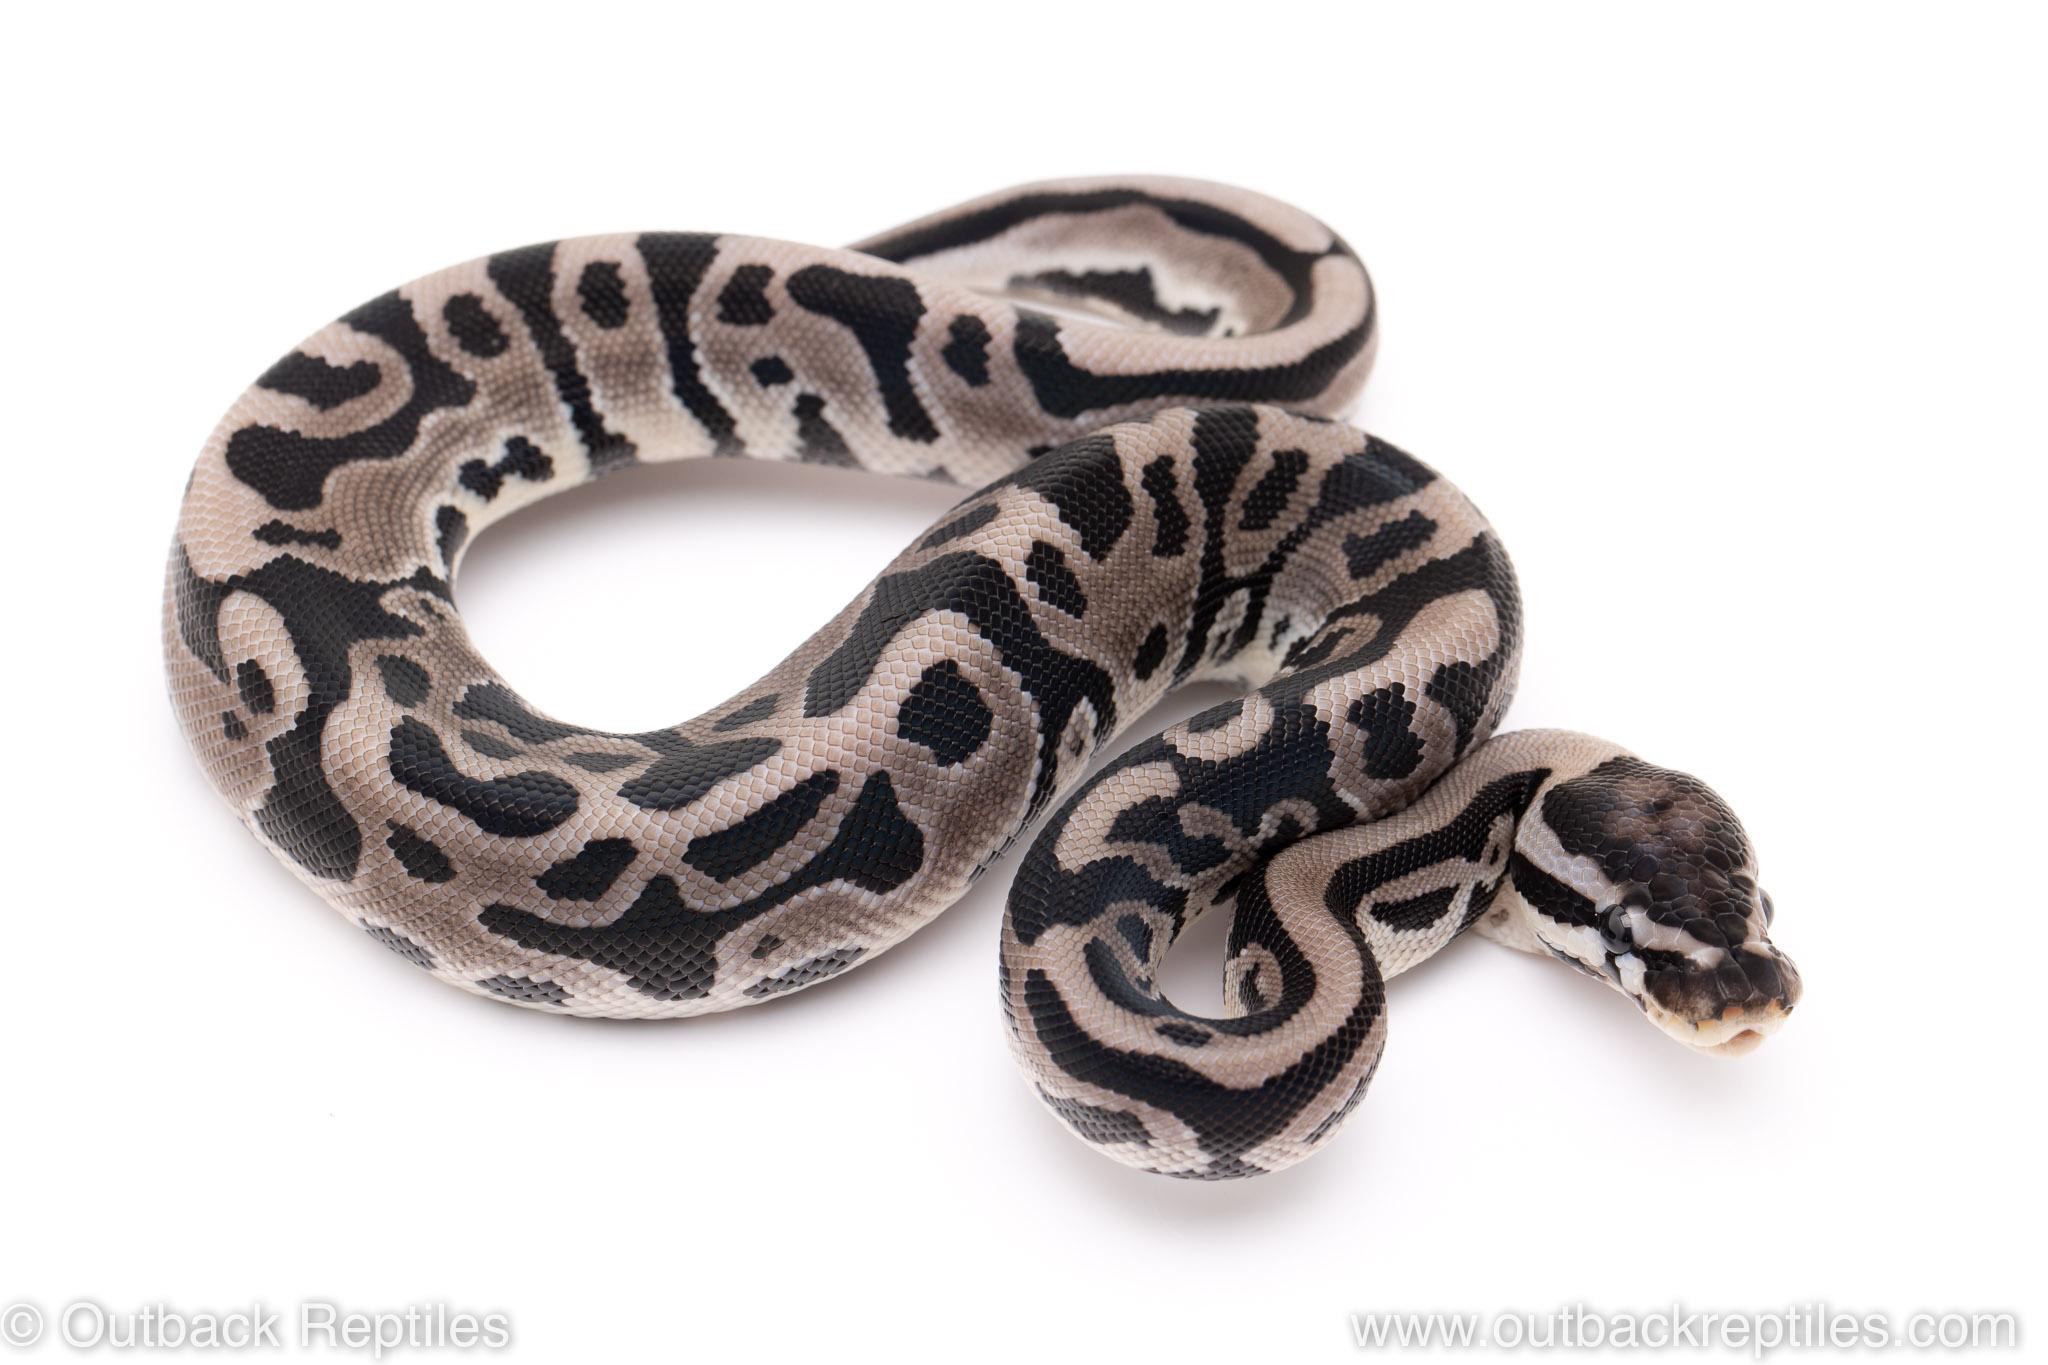 VPI Axanthic leopard poss het pied ball pythons for sale